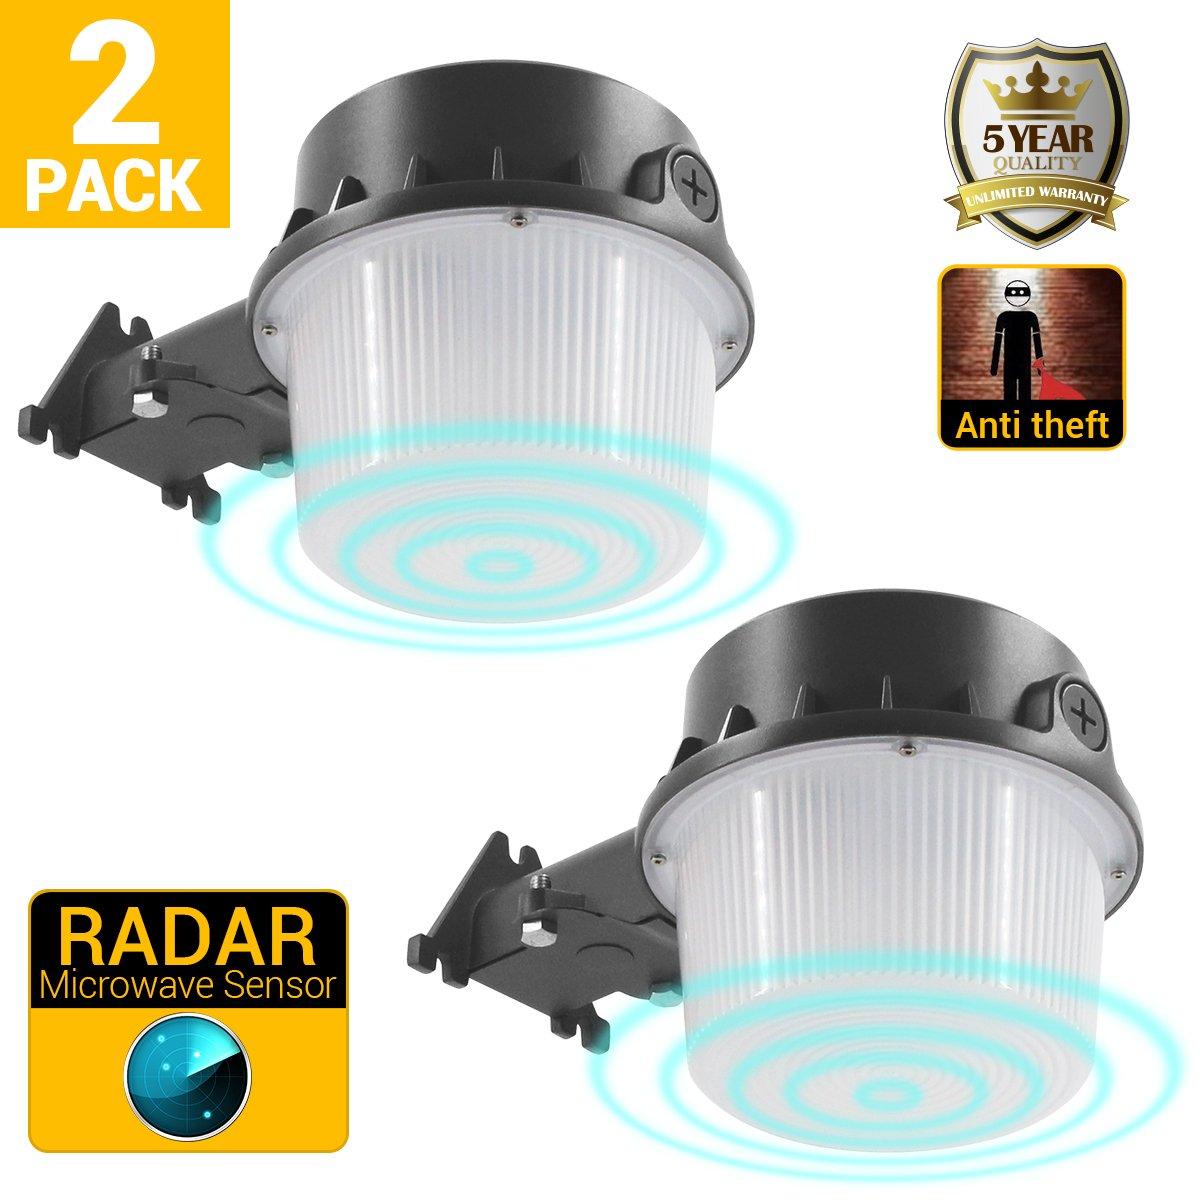 Outdoor Yard Light, Security Microwave Radar Motion Sensor, 35W Barn Light for Area Lighting, 5000K, 3700lm Floodlight ETL/cETL Approved Pack of 2